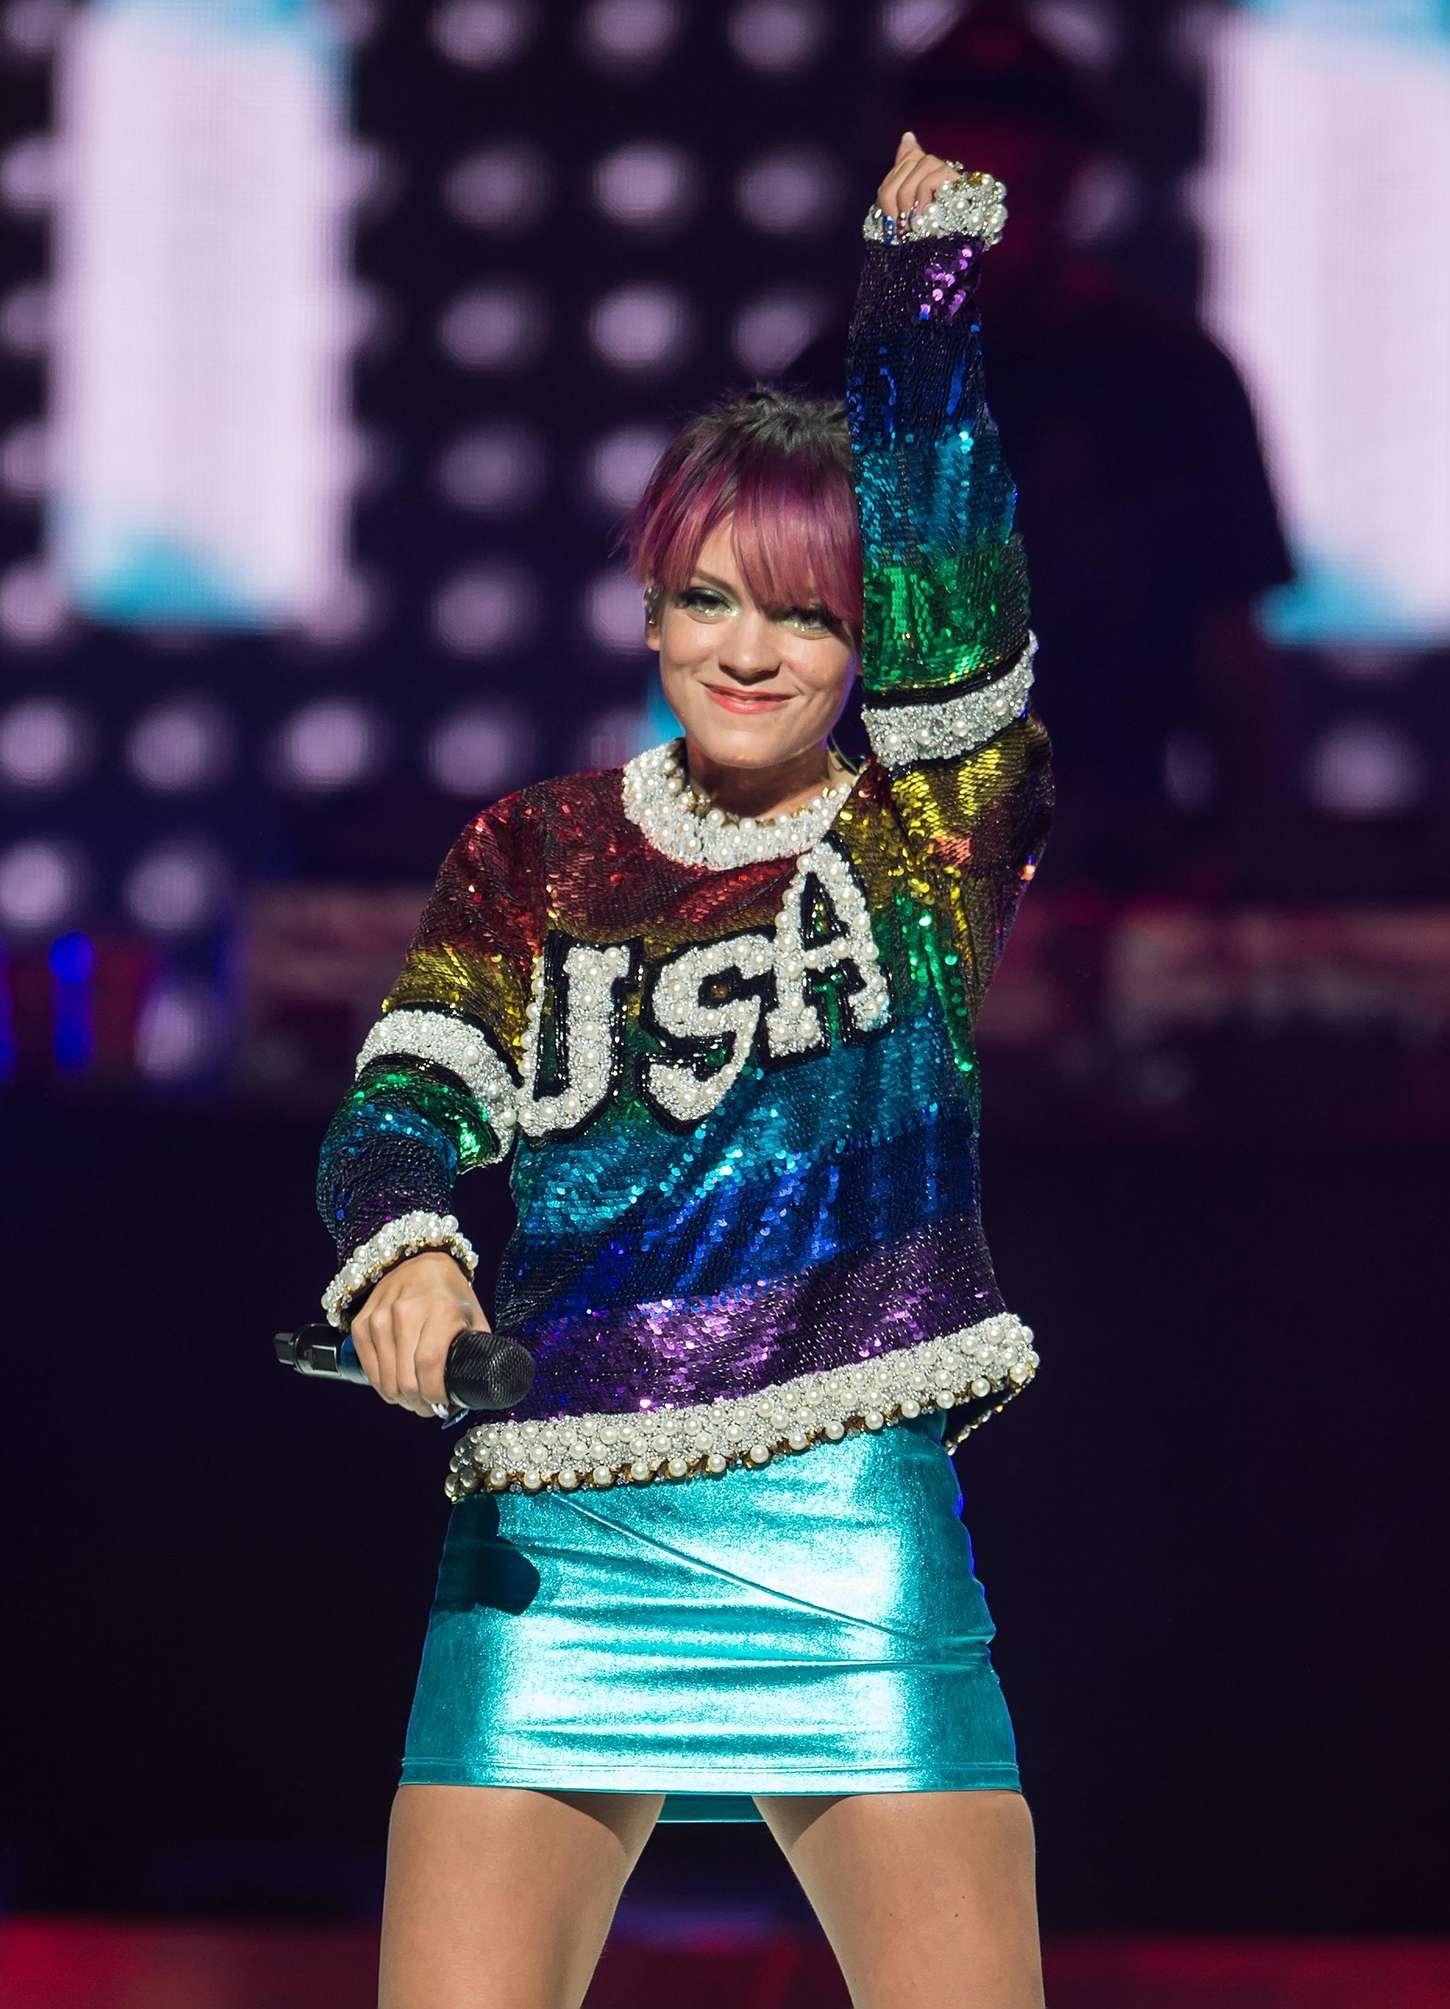 Lily Allen 2014 : Lily Allen Performs Live in Philadelphia -06